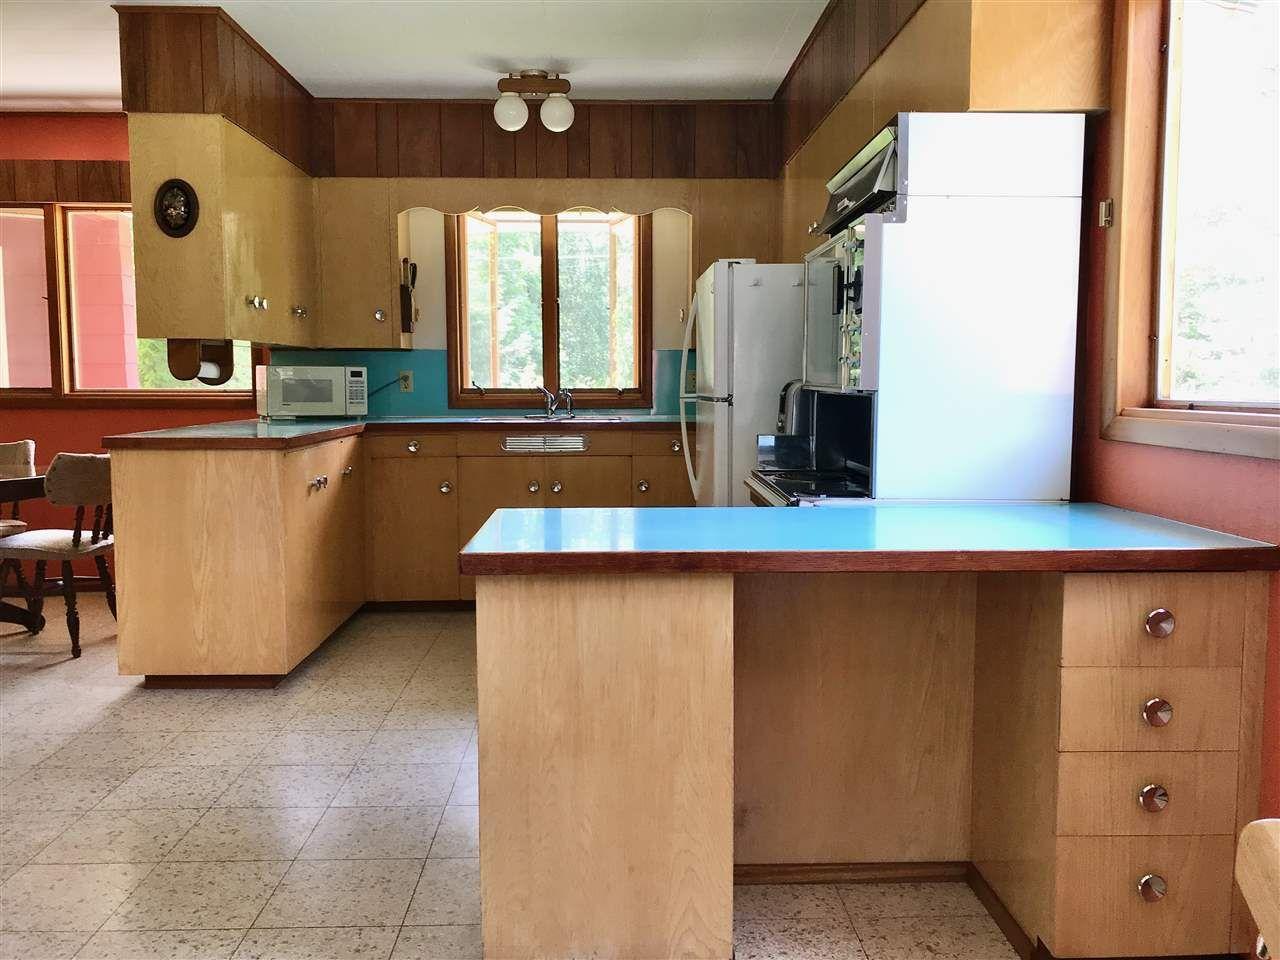 Photo 14: Photos: 944 MACKENZIE Highway in Bella Coola: Bella Coola/Hagensborg House for sale (Williams Lake (Zone 27))  : MLS®# R2482254